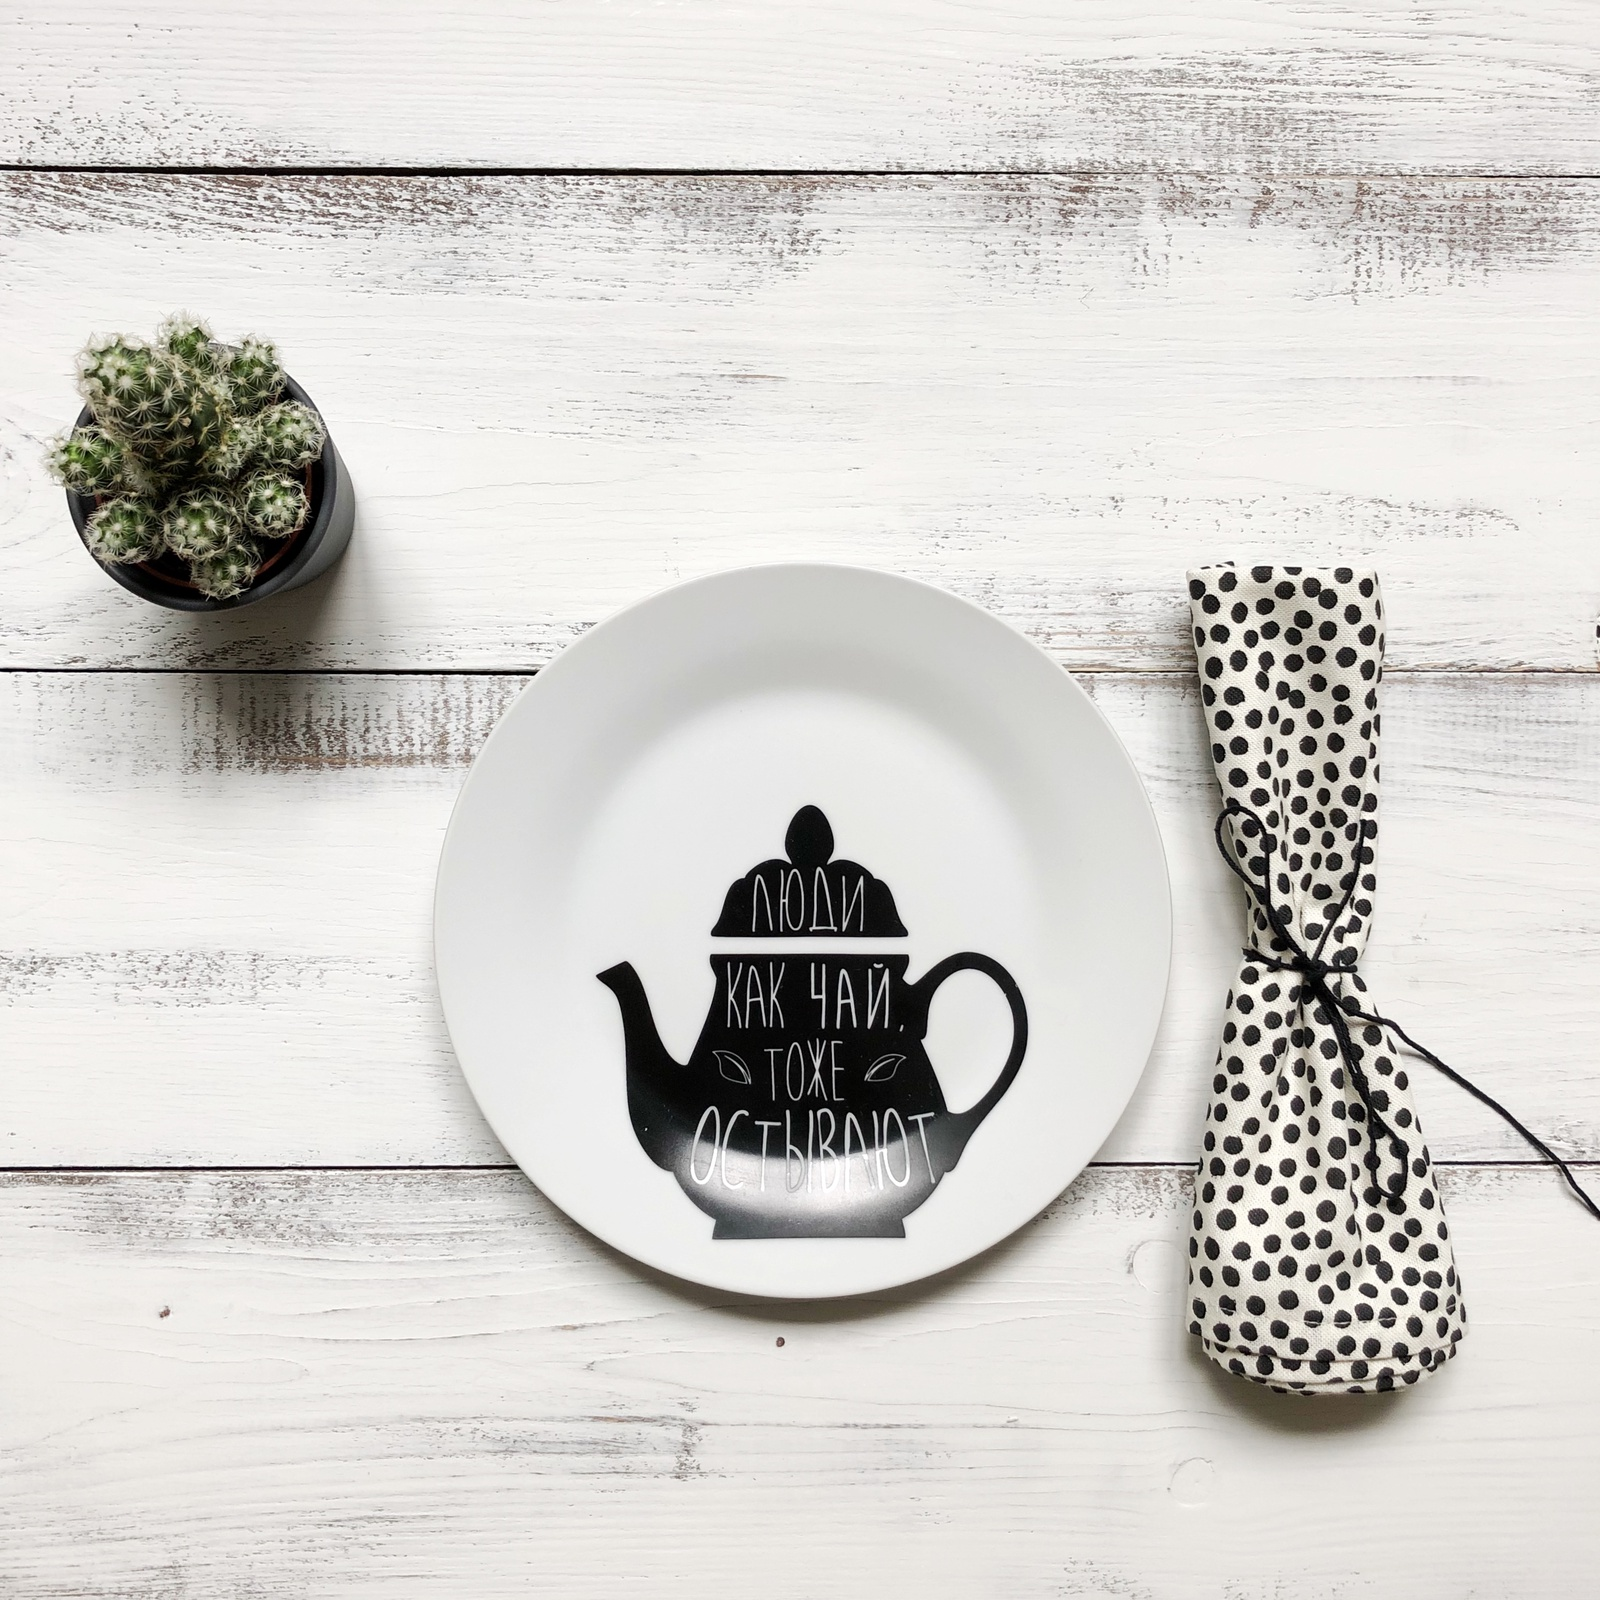 Тарелка Сотвори Чудо Люди как чай 20 см, белый тарелка сотвори чудо киска диаметр 23 см